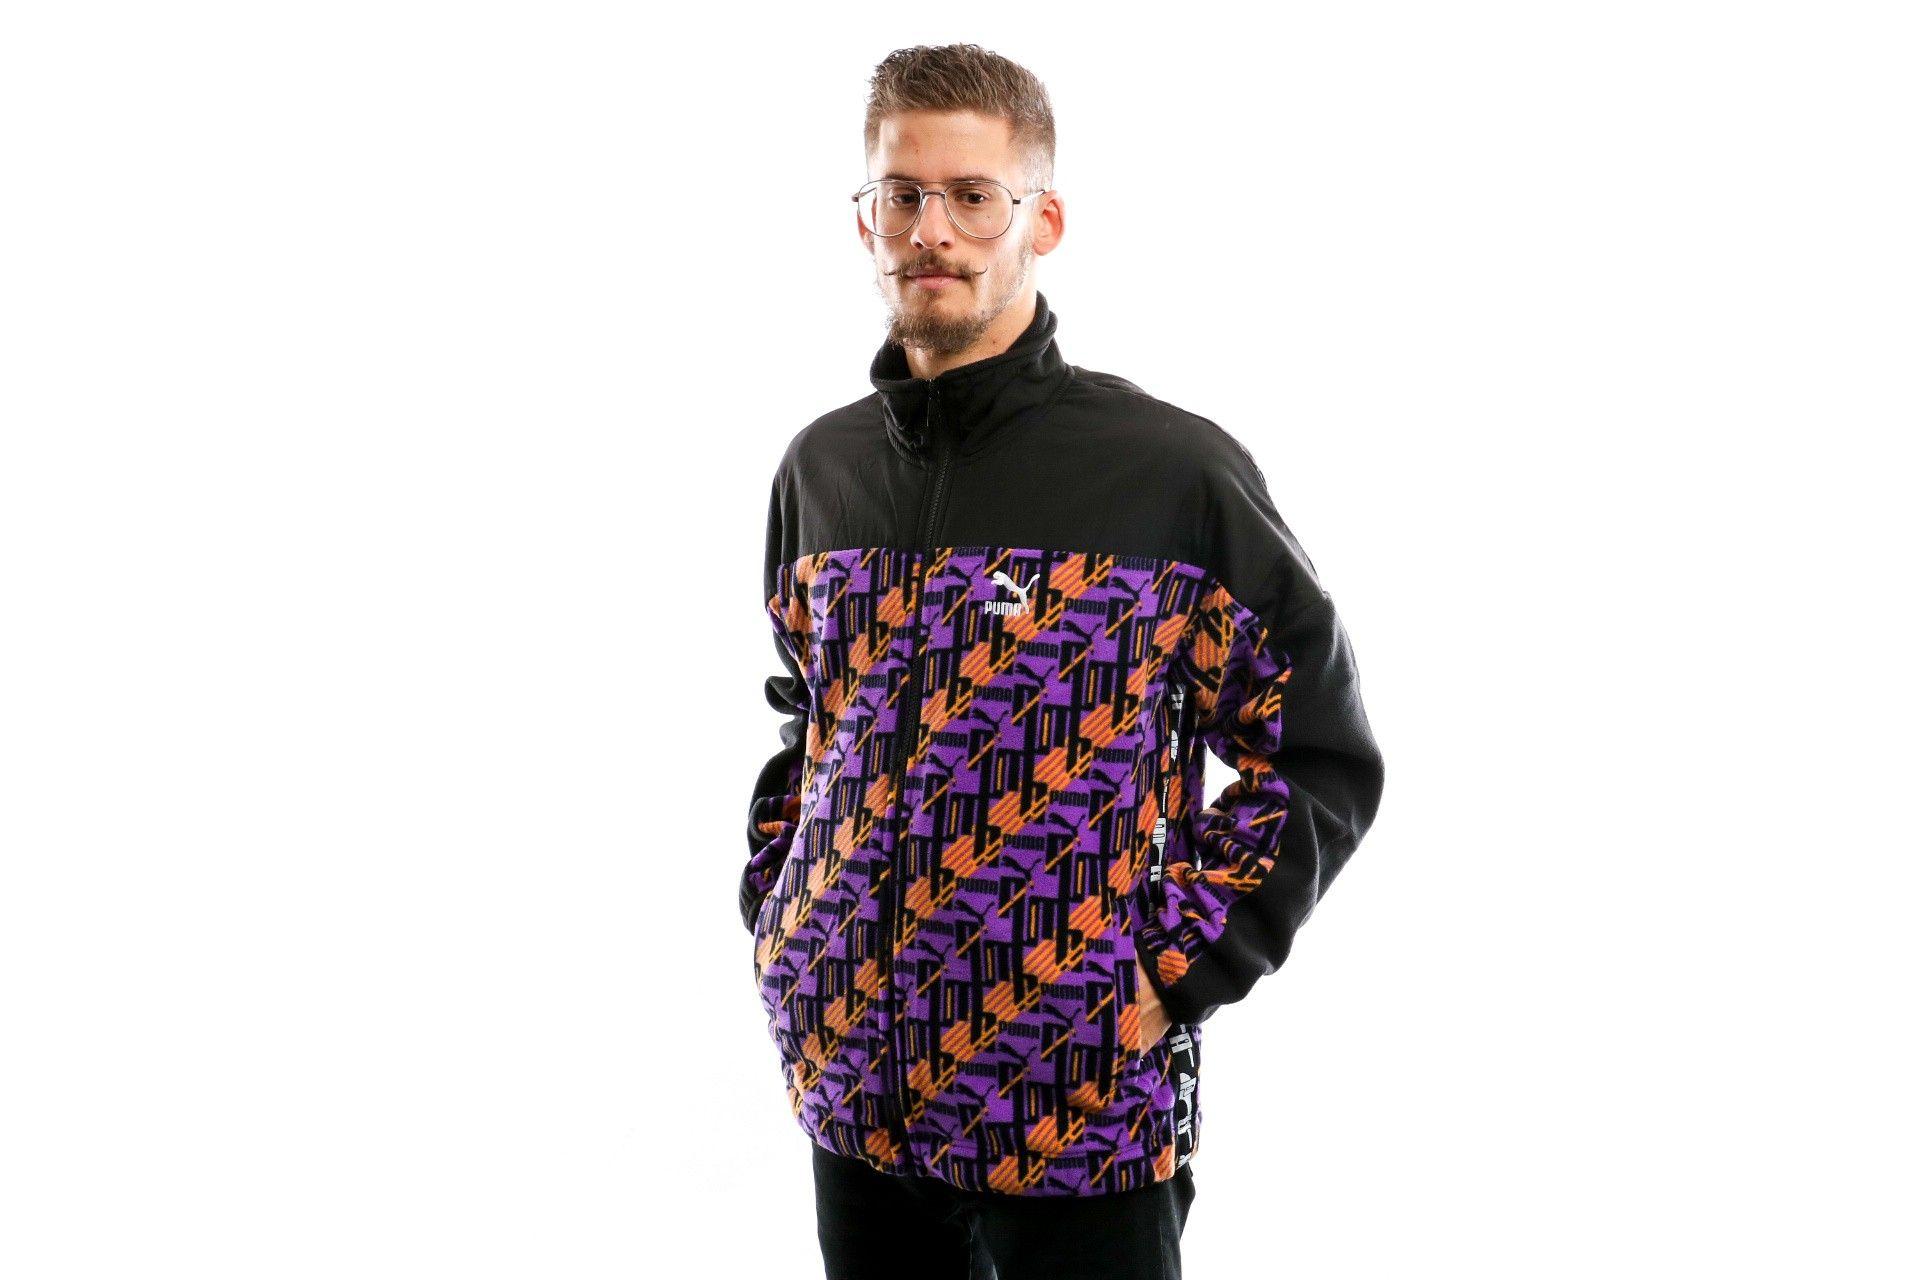 Afbeelding van Puma Xtg Woven Jacket Aop Jaffa Orange-Purple 595540 17